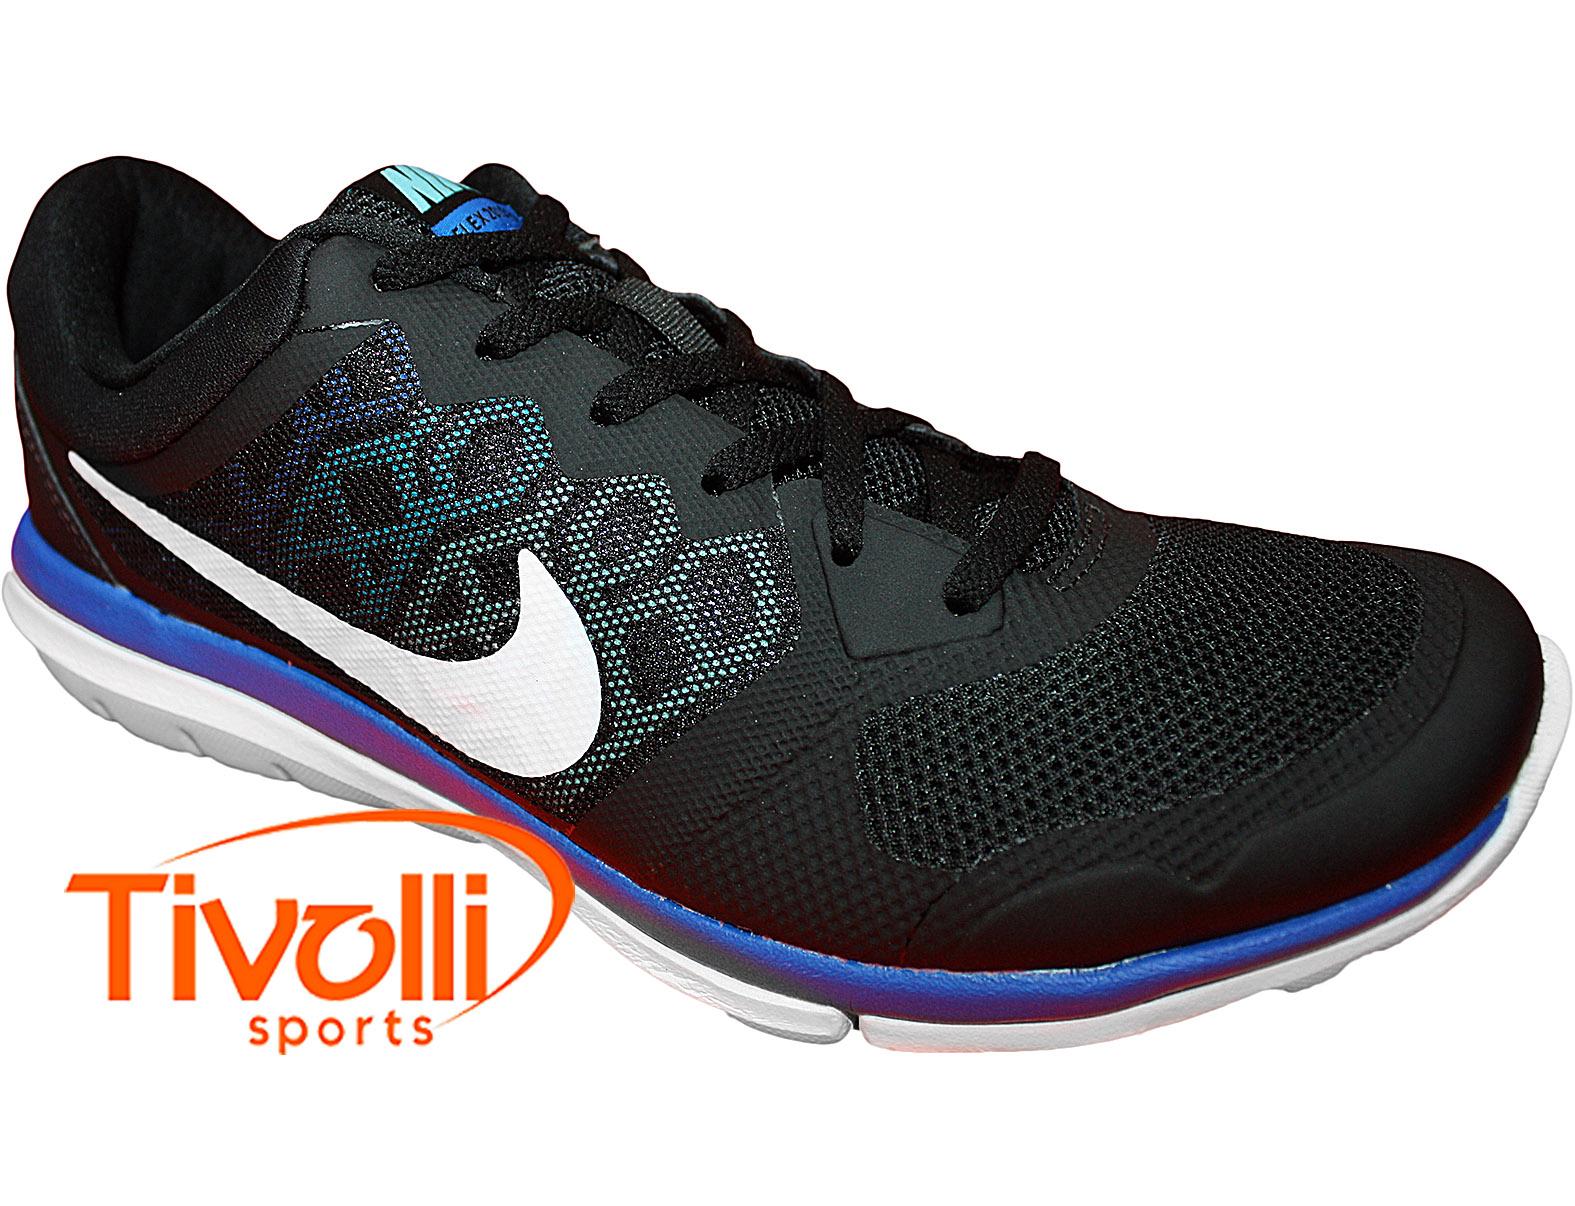 2172a844f65 Tênis Nike Flex 2015 RN MSL   unisex preto